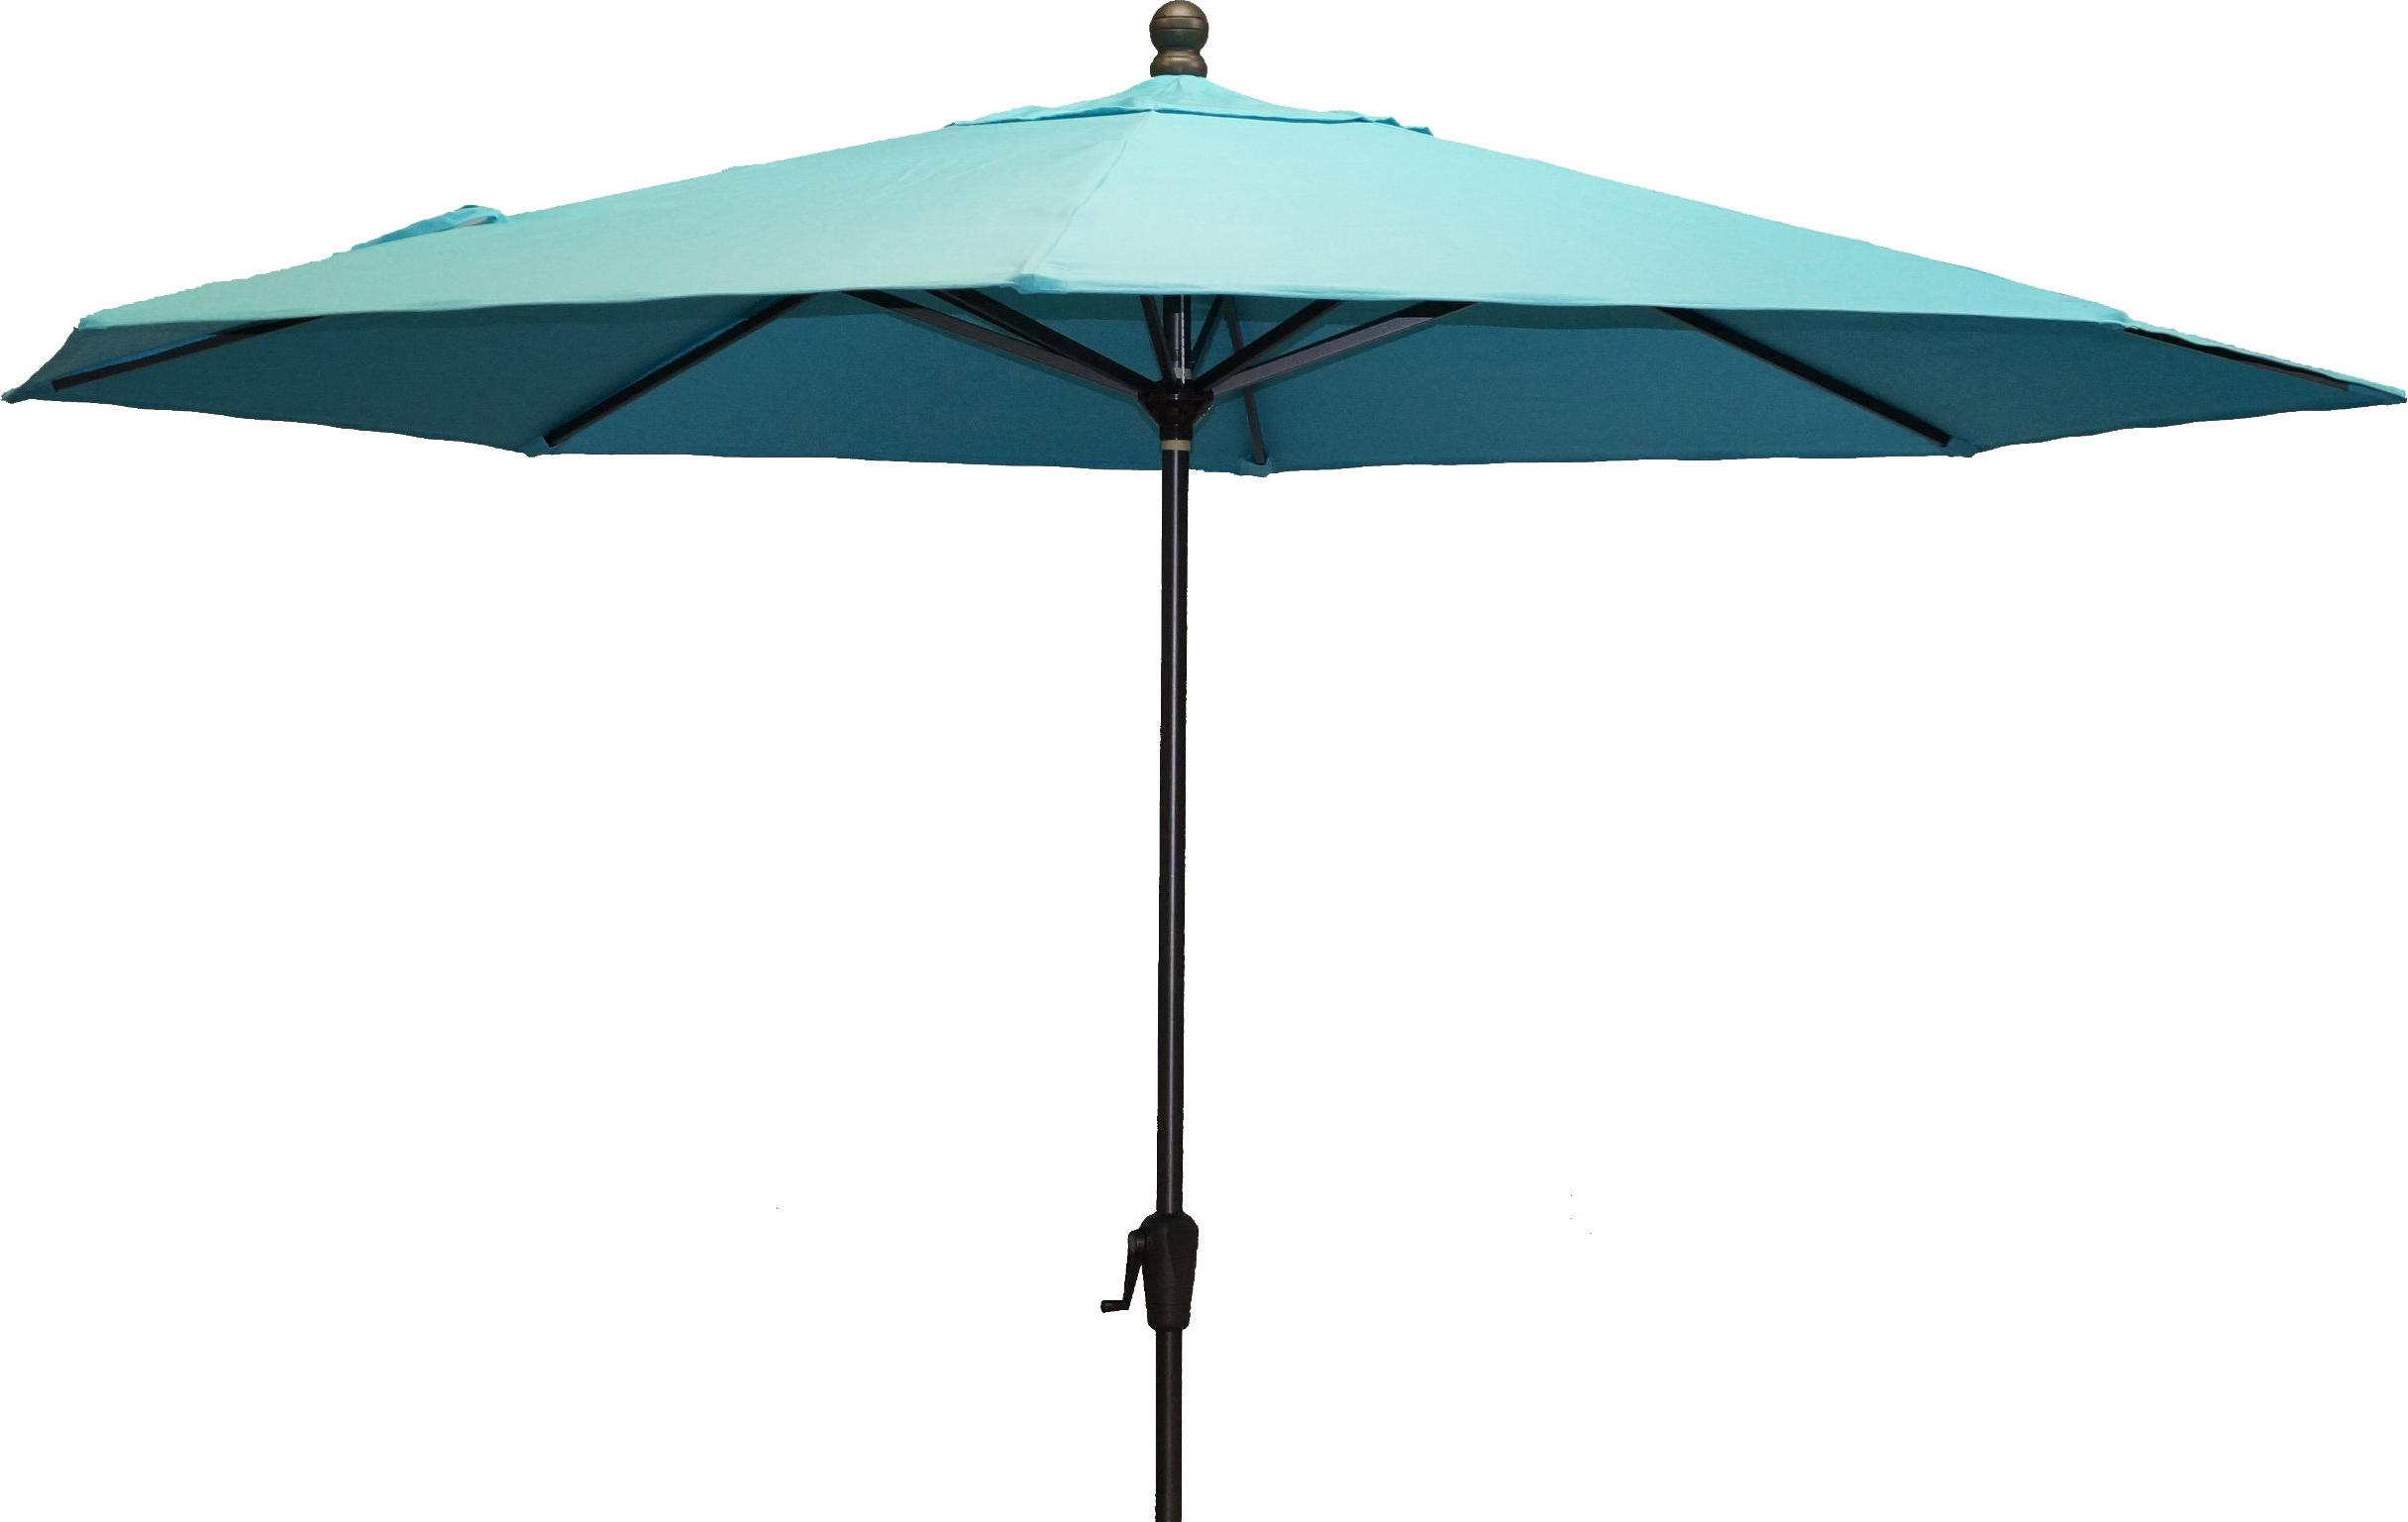 Best And Newest Keegan Market Umbrellas Regarding Melanie 11' Market Sunbrella Umbrella (View 6 of 20)